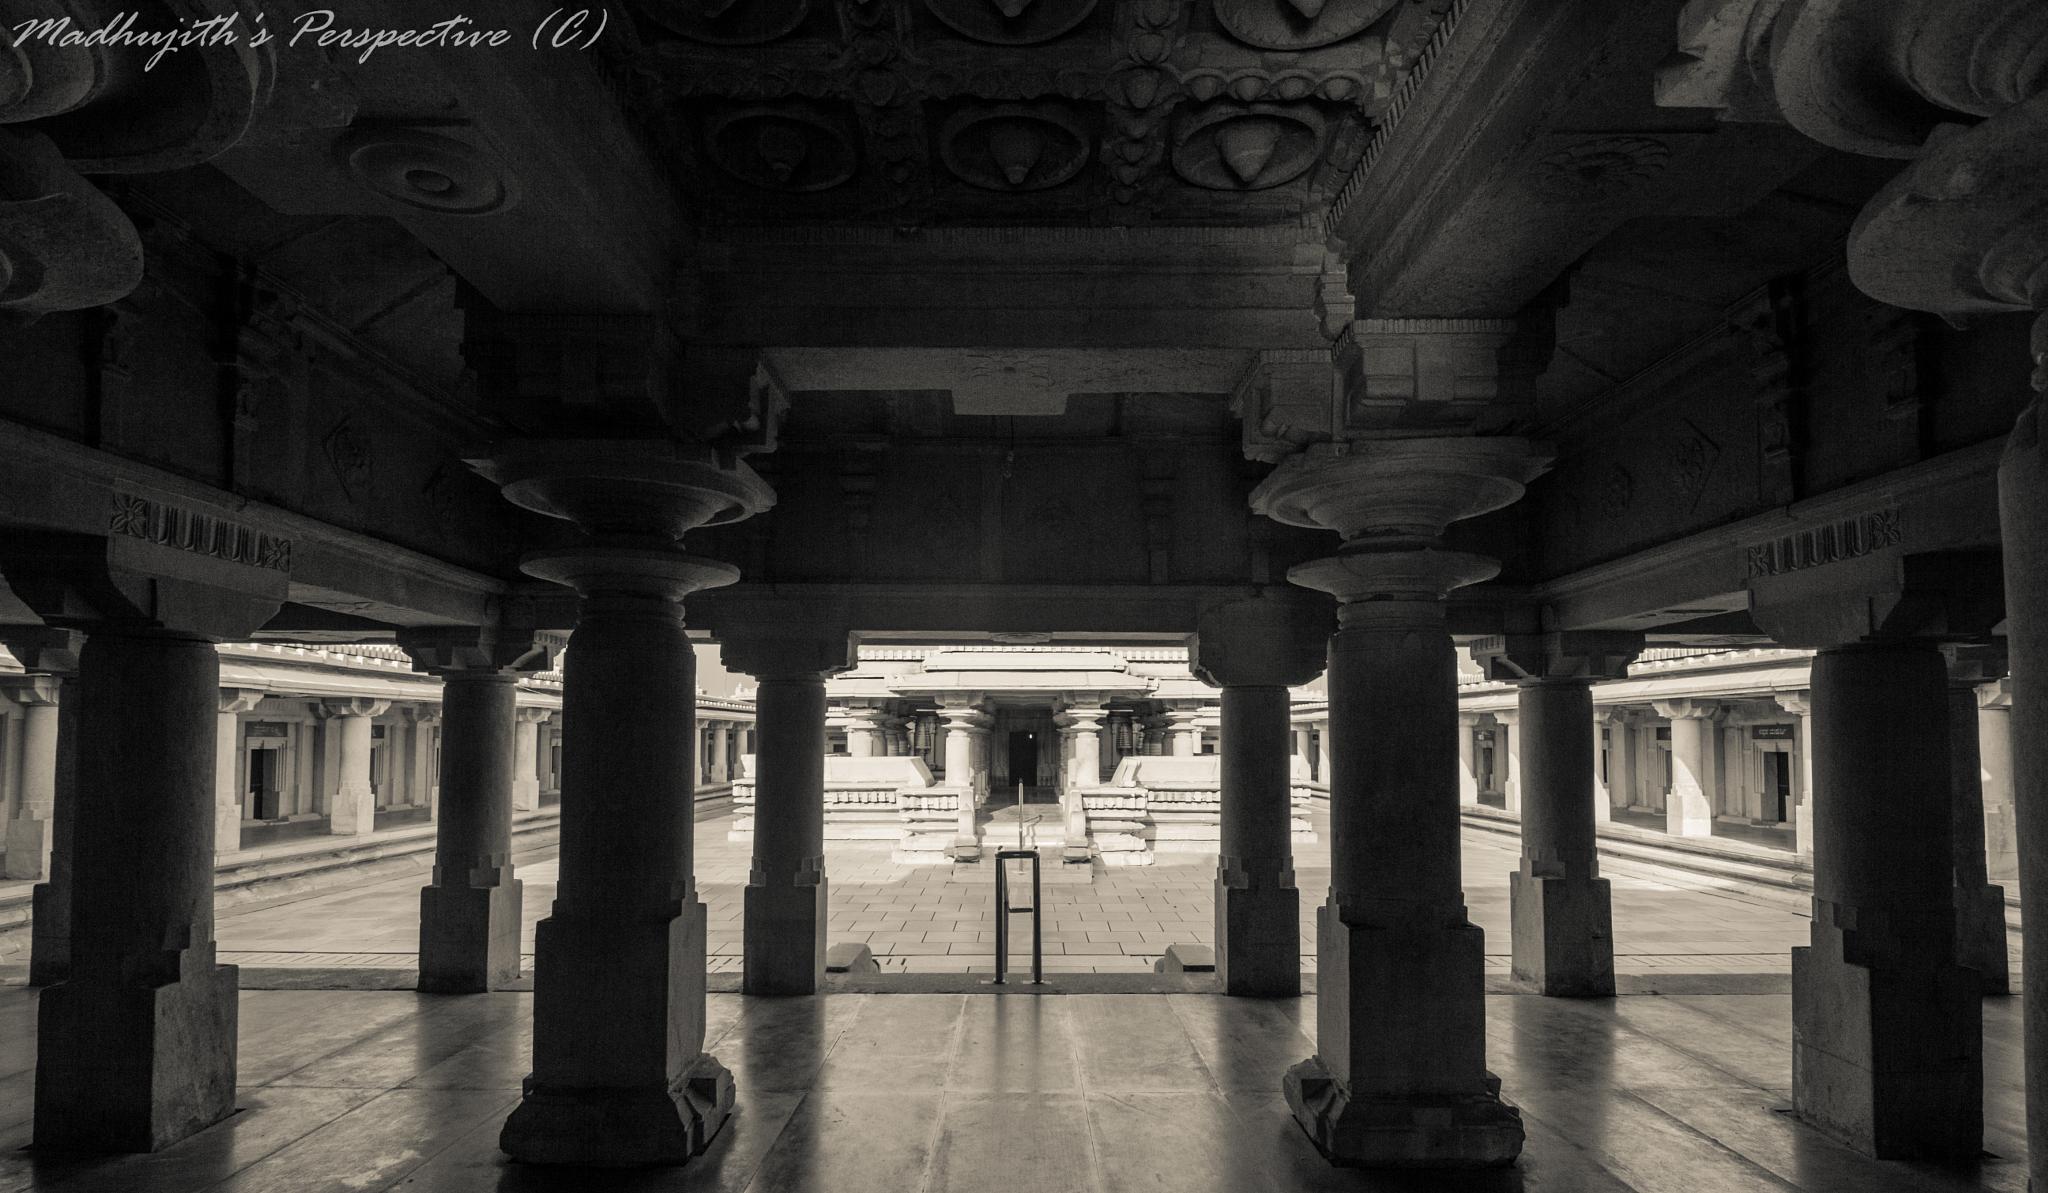 Through the Pillars by madhujith